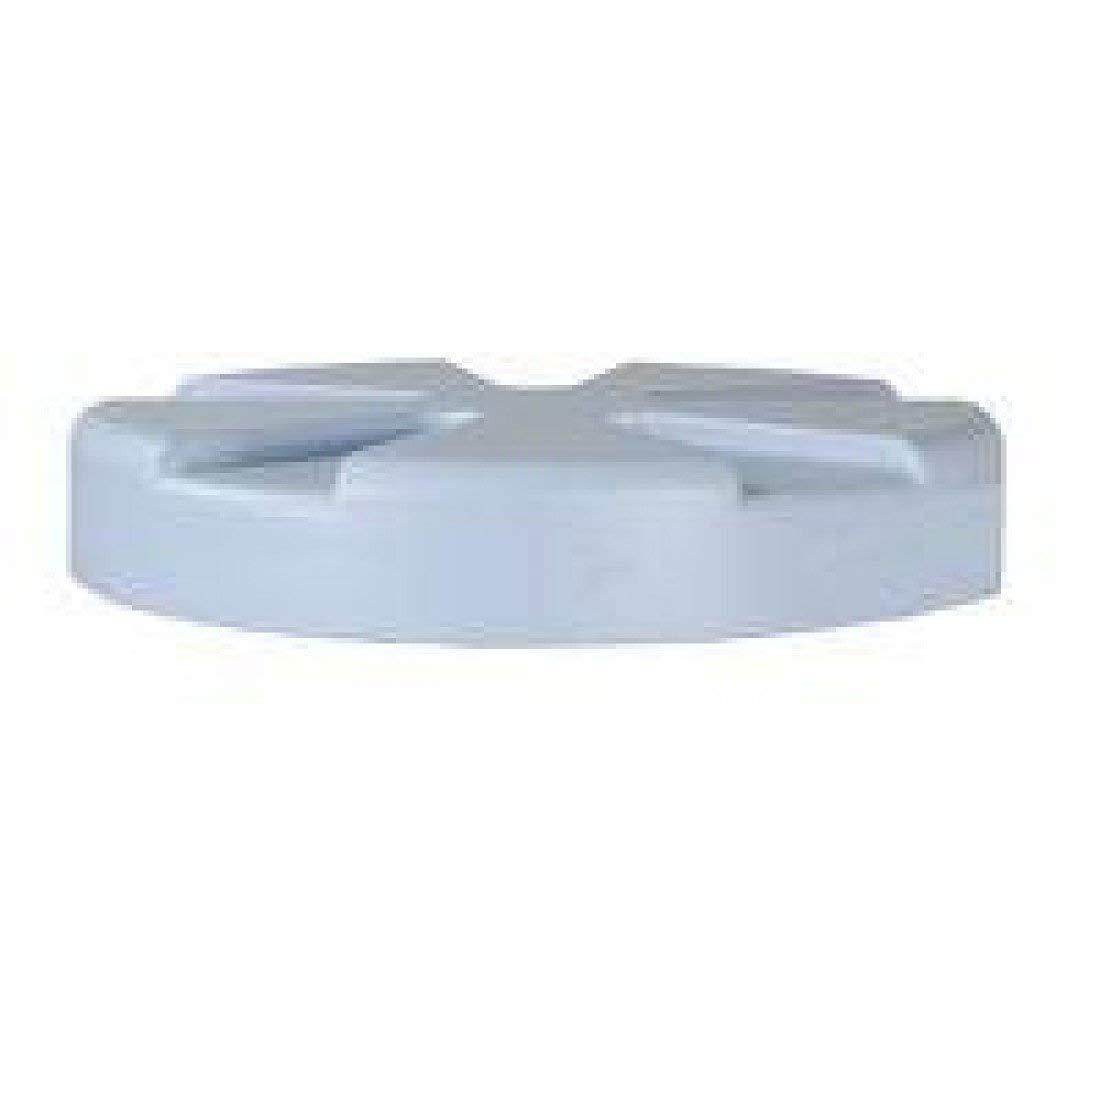 Gott Industrial fg09760692 Tapa para Enfriador de Agua, 10 ...